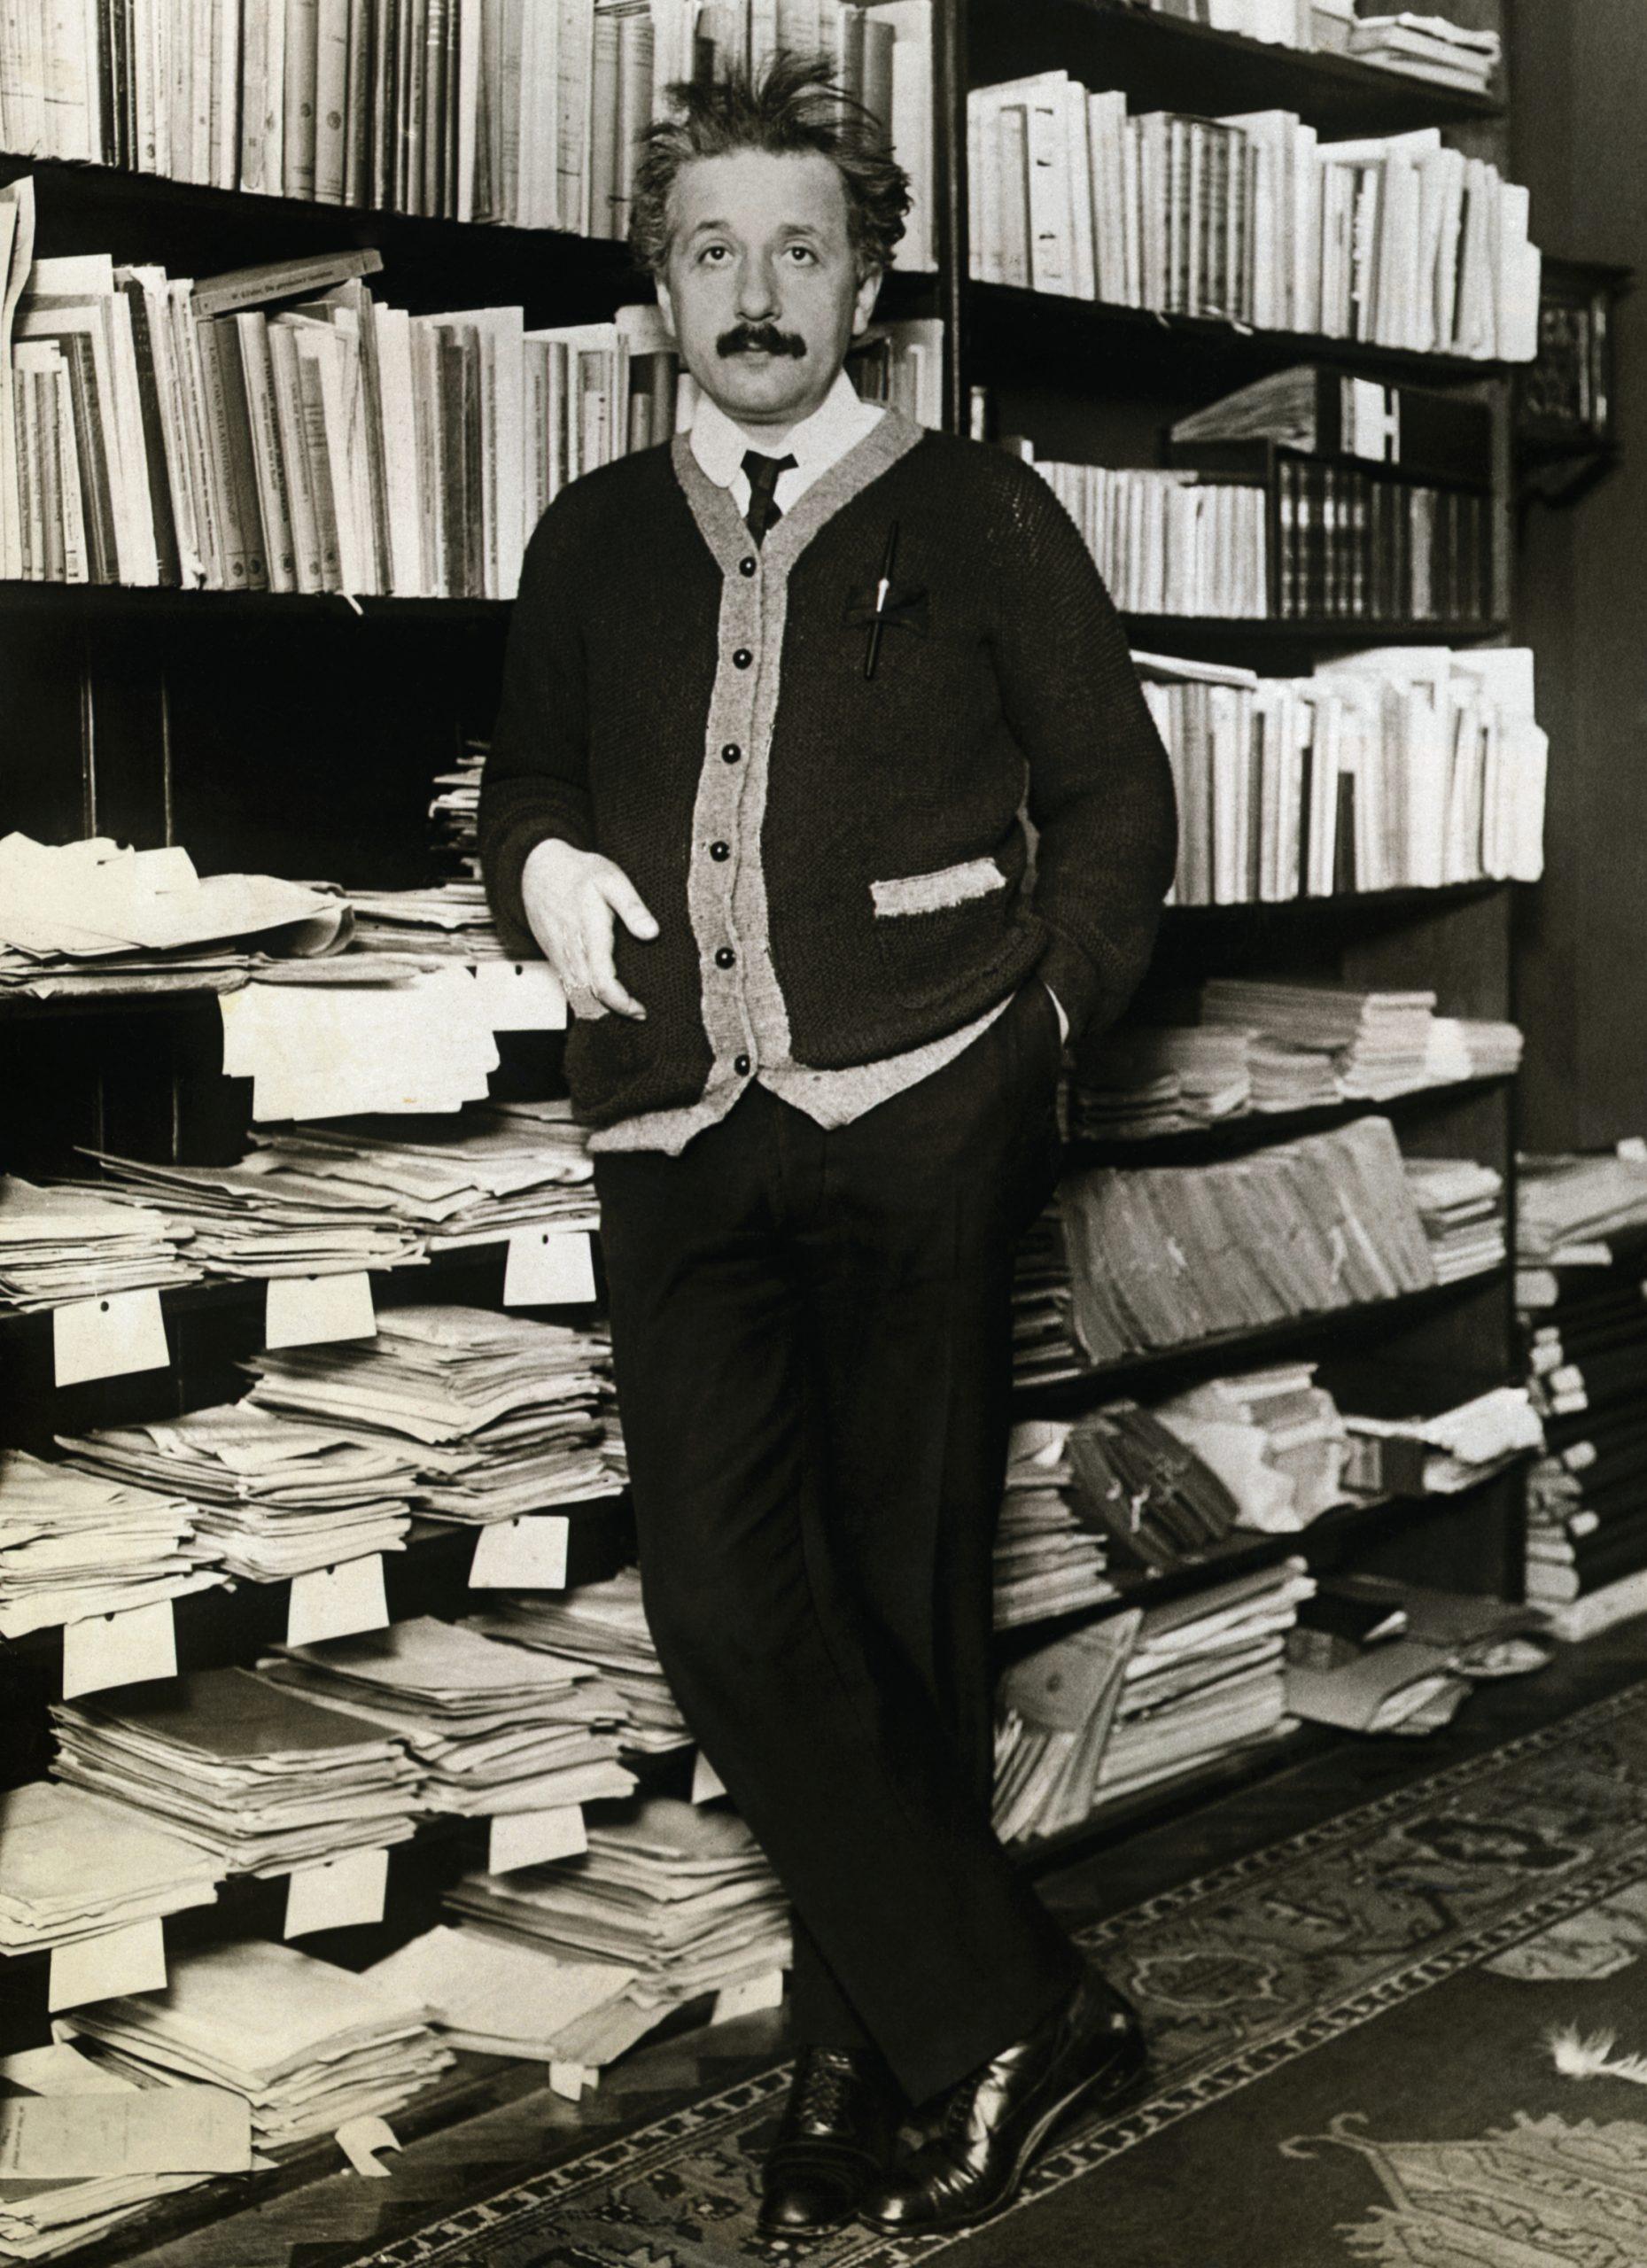 Albert Einstein leaning against shelves of scientific books